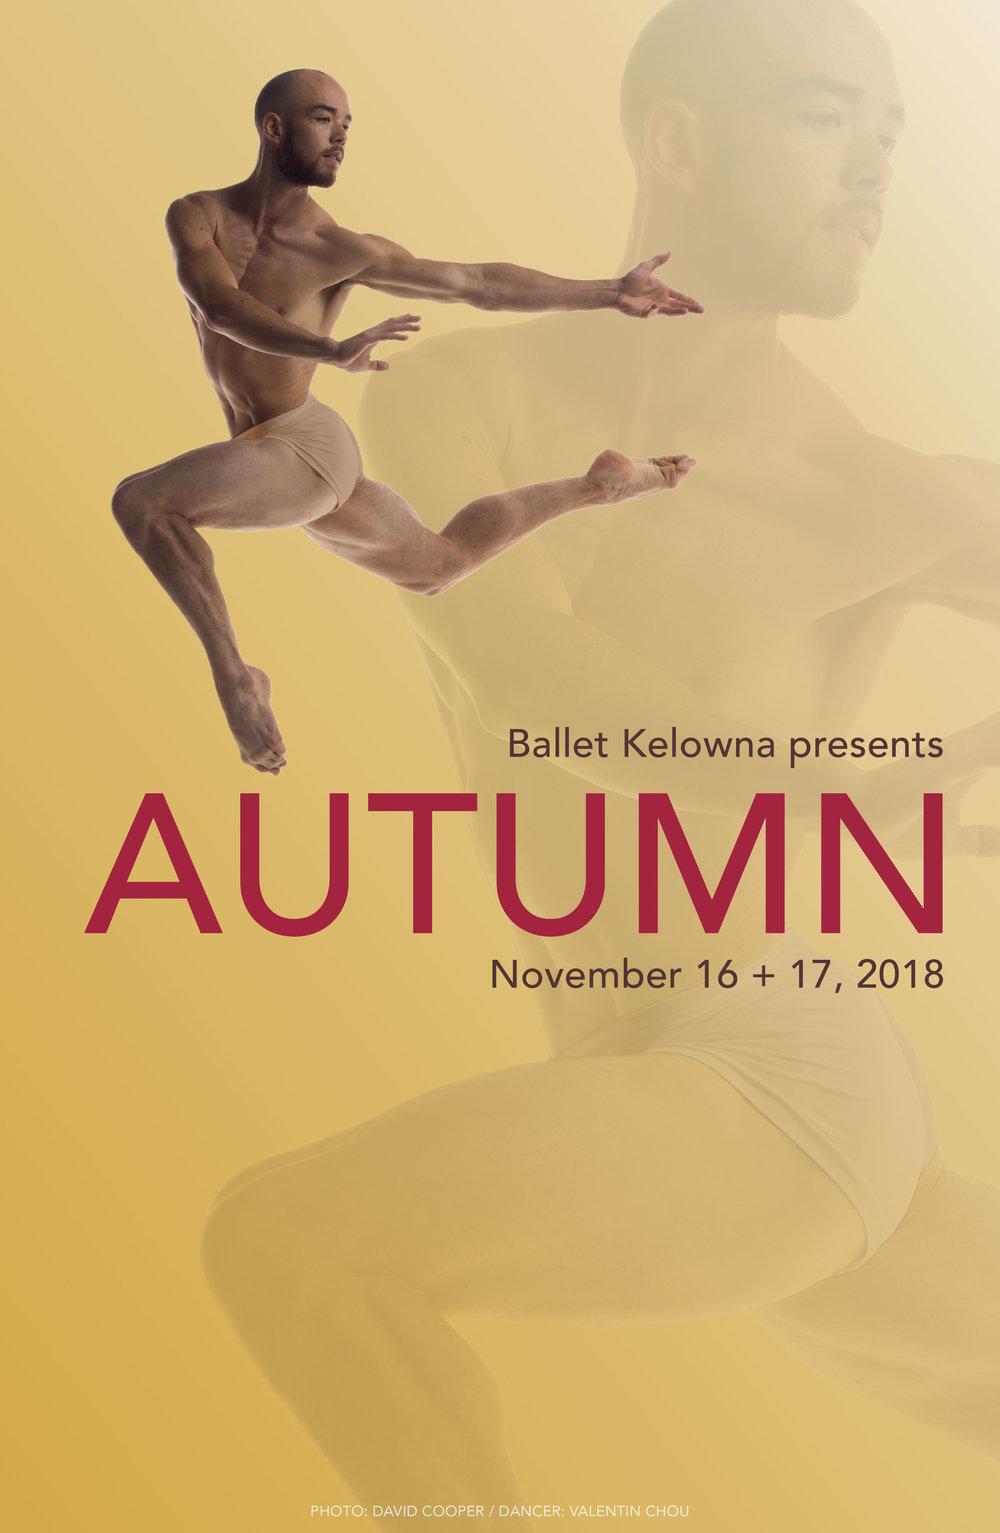 Autumn Poster 11x17.jpg